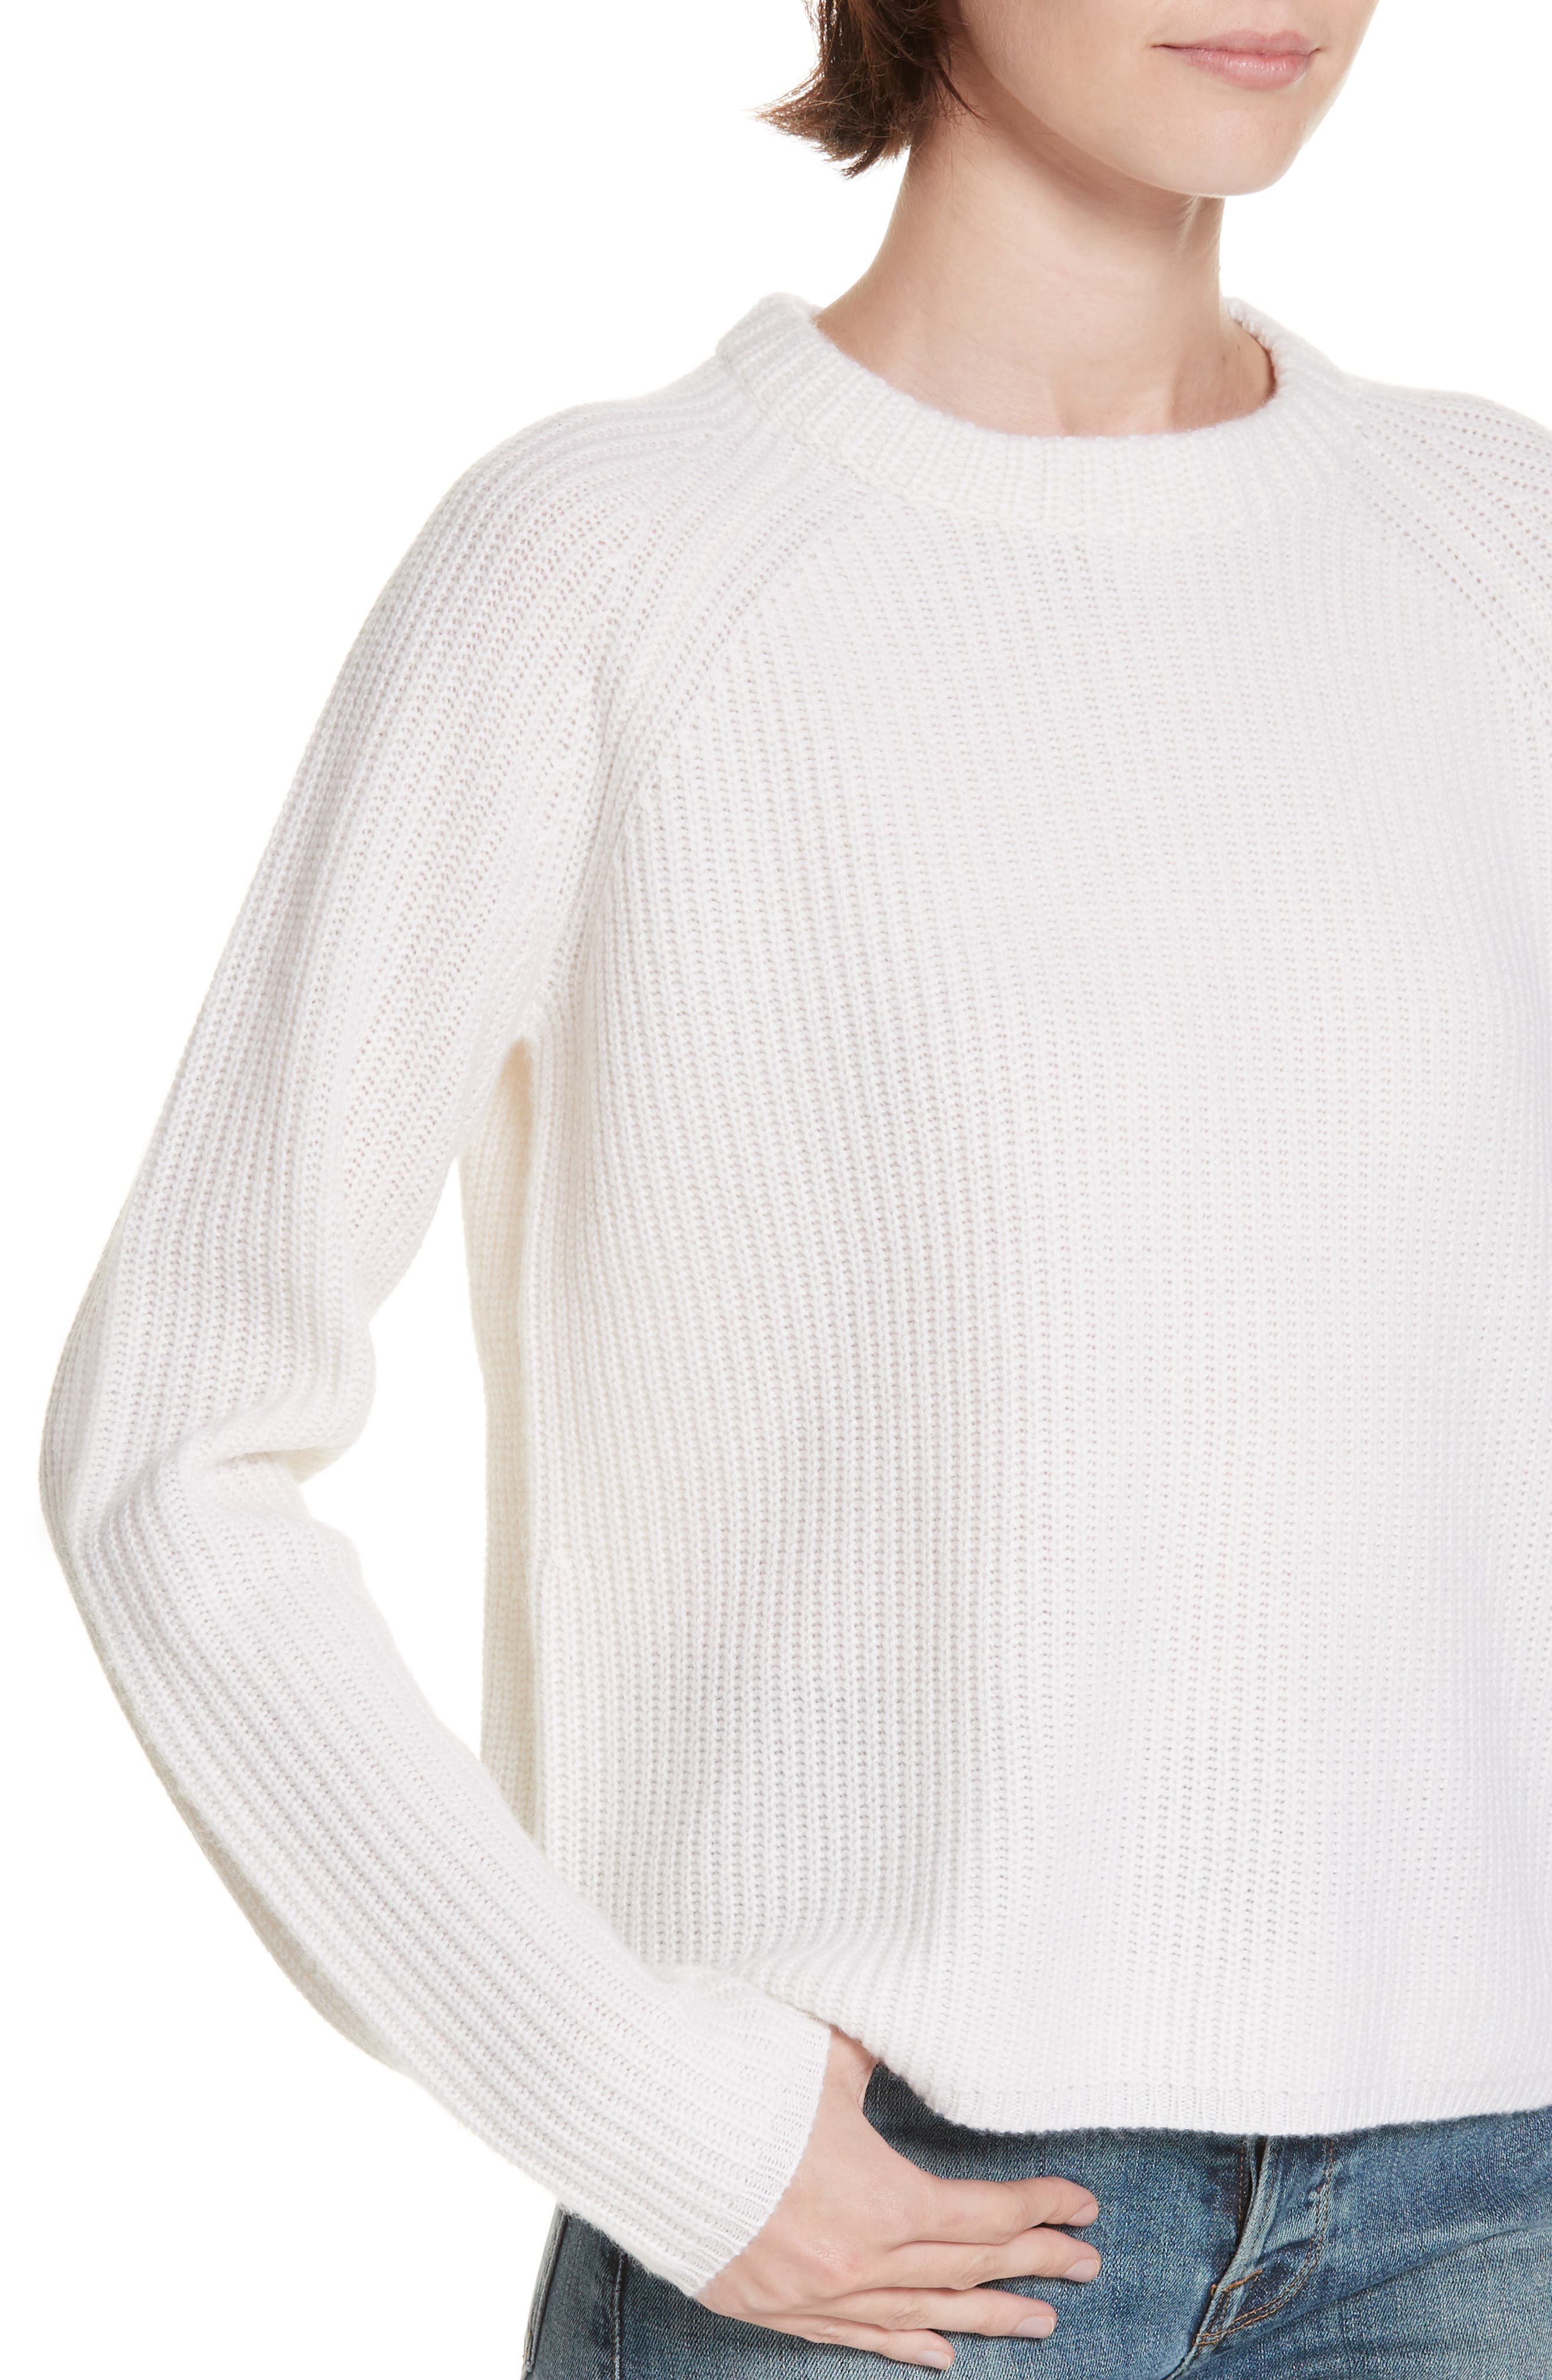 Fisherman Crewneck Cashmere Sweater,                             Alternate thumbnail 4, color,                             IVORY